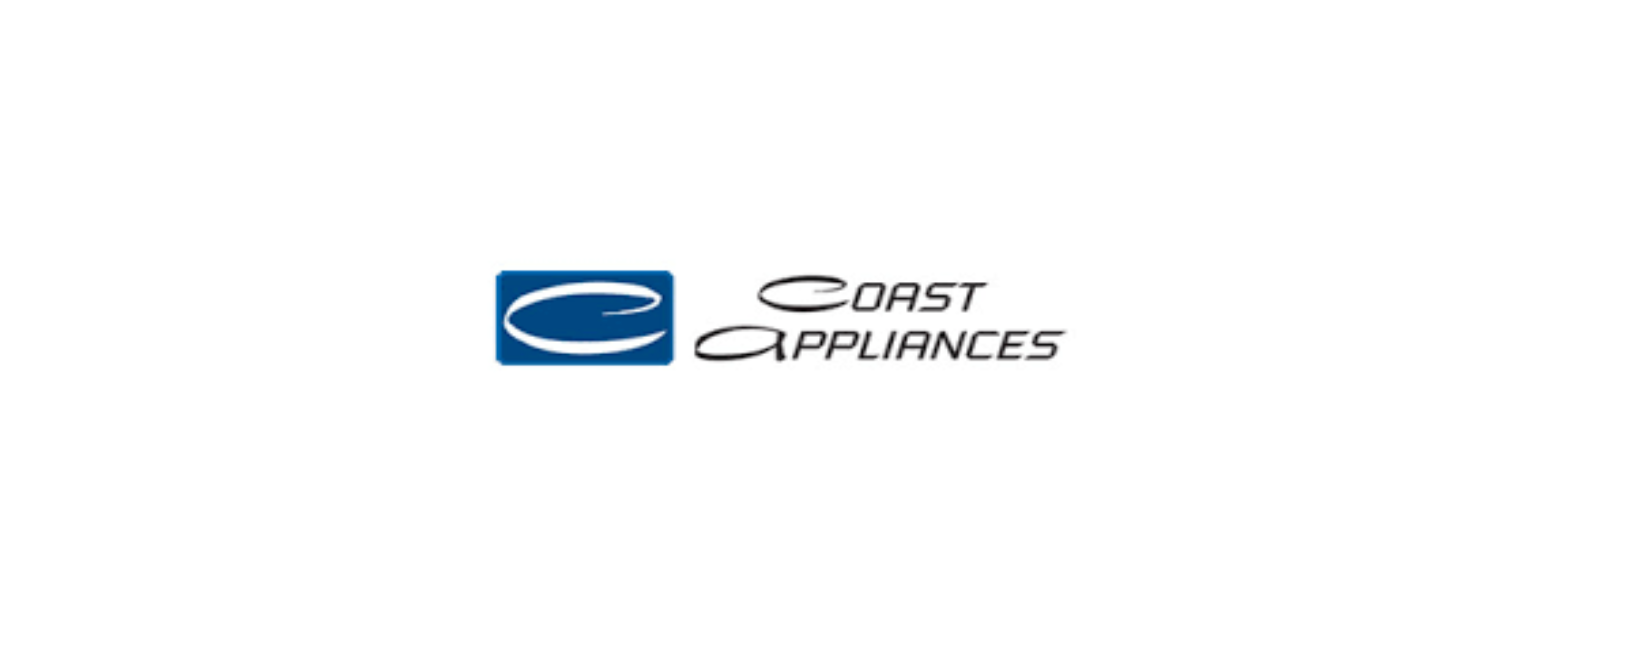 Coast Appliances Discount Code 2021